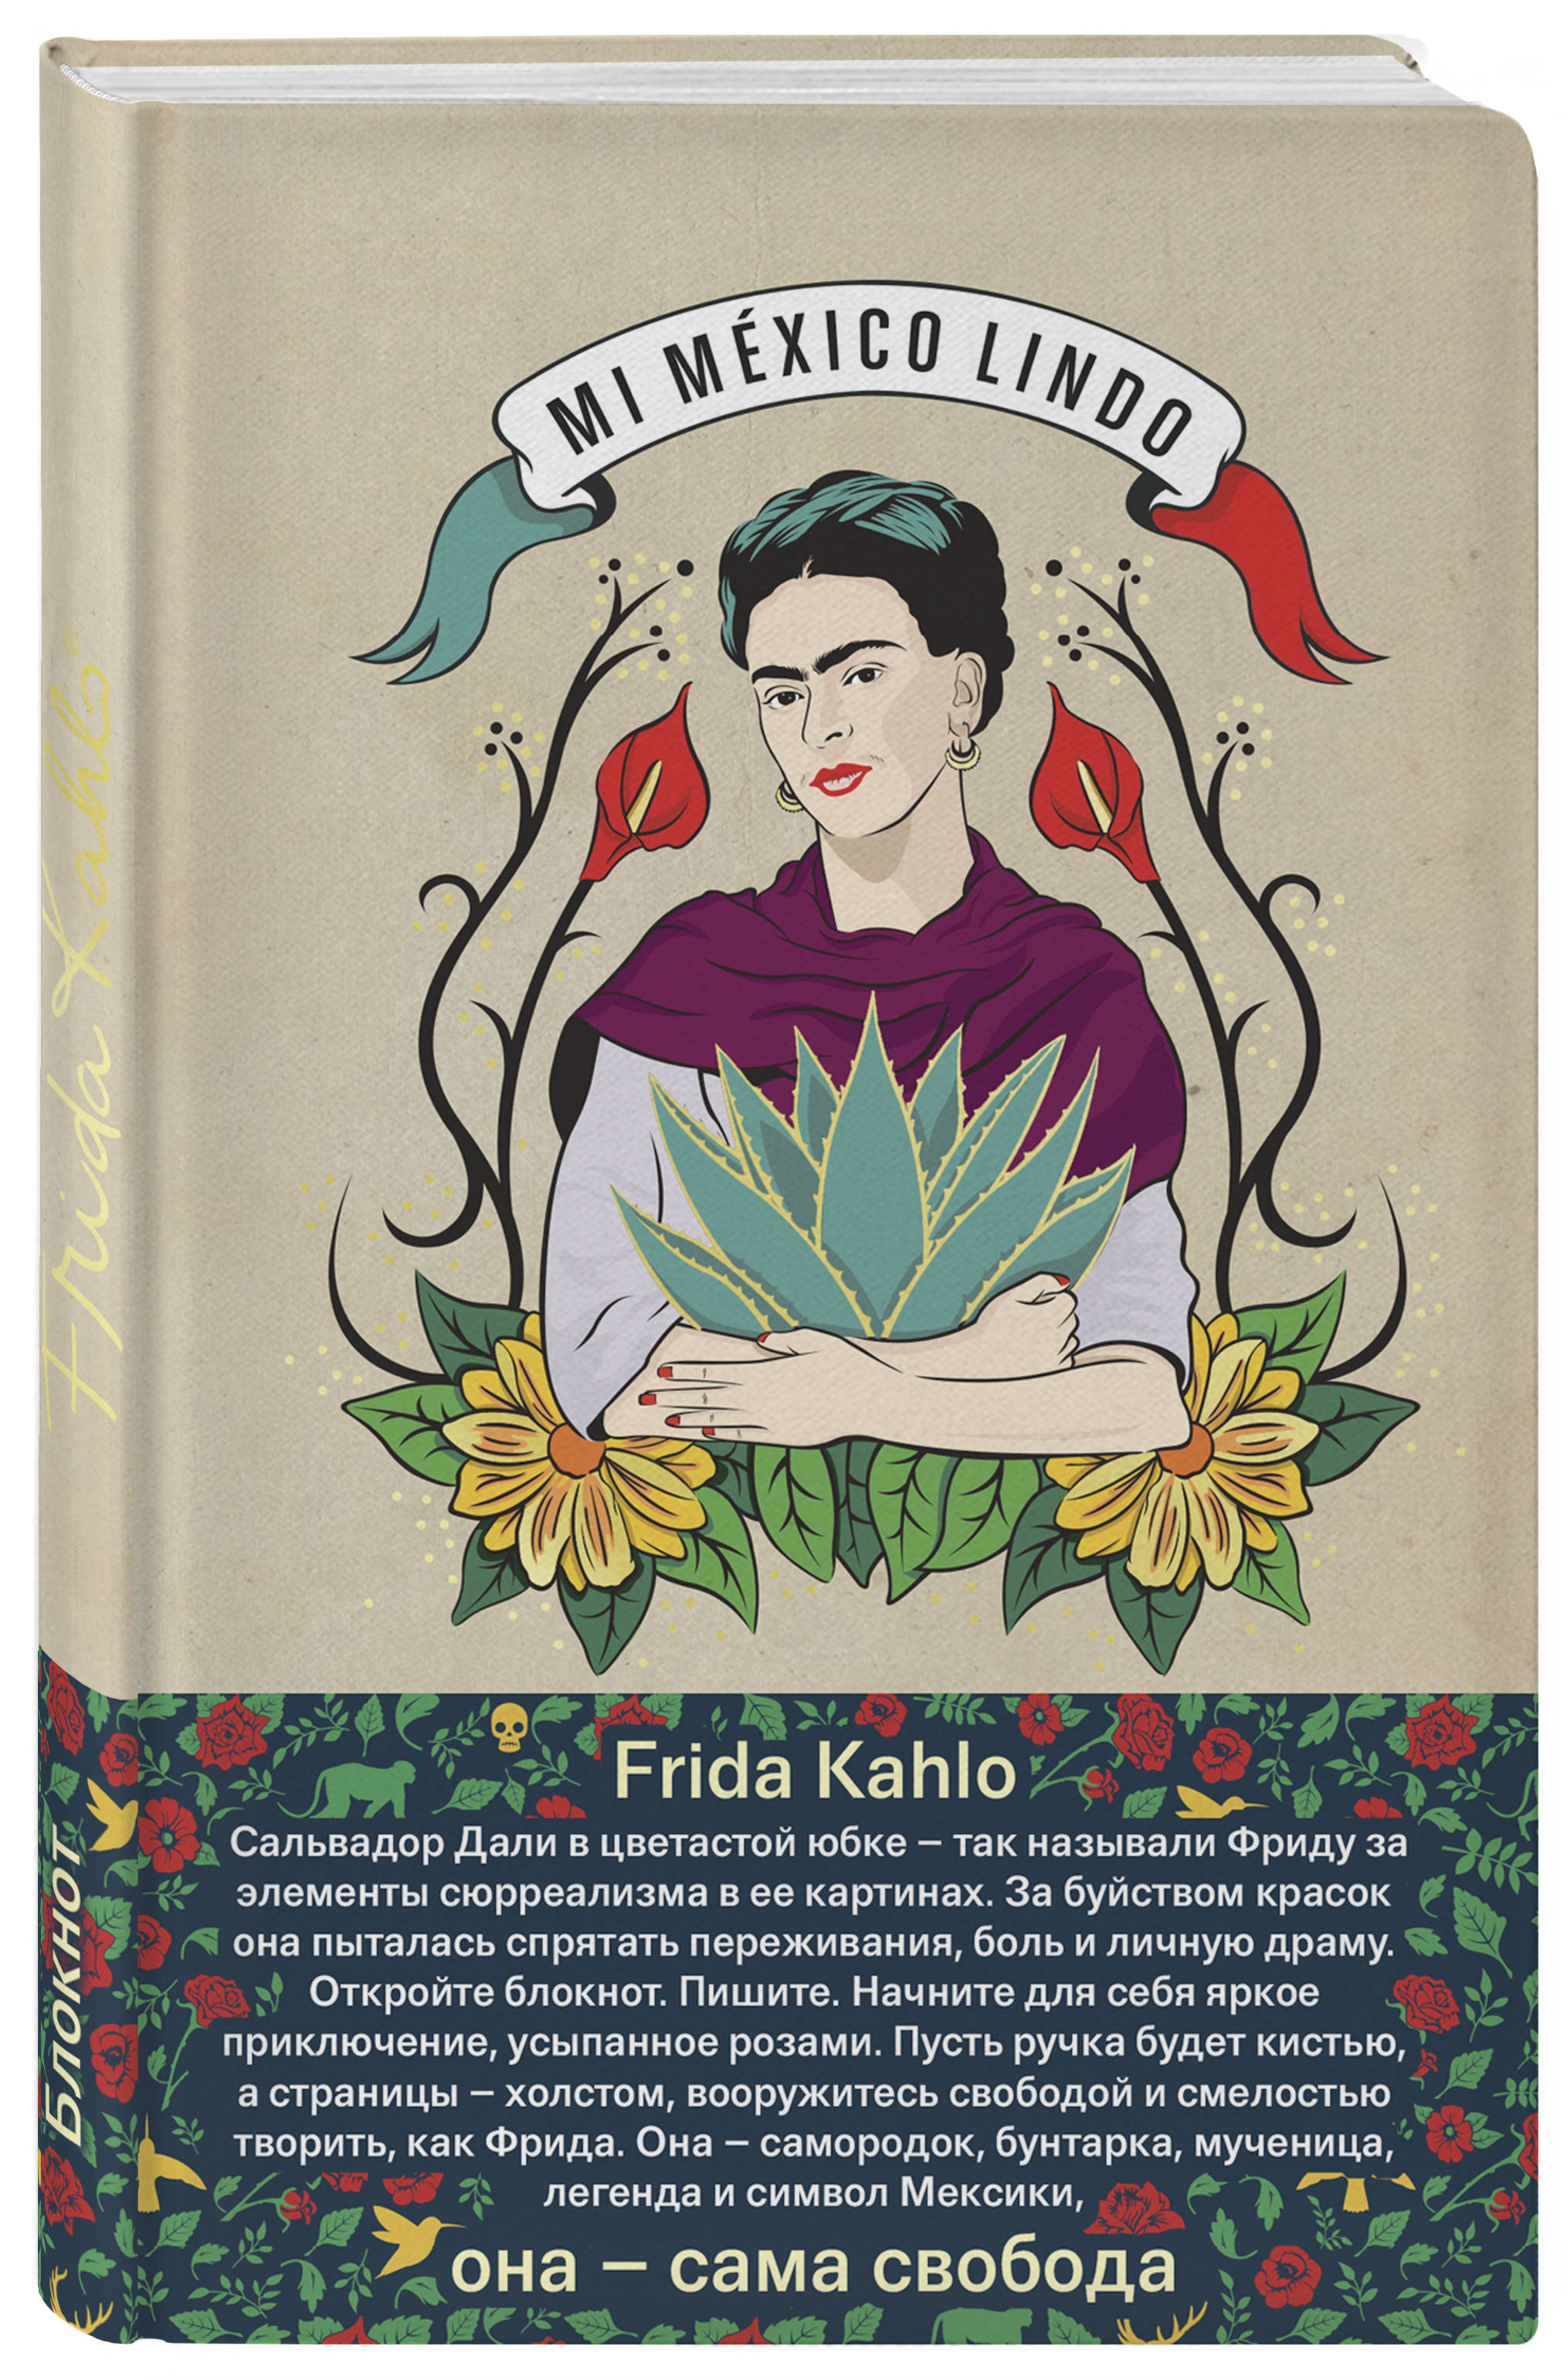 Блокнот. Фрида Кало (бежевая обложка) (Арте) фигурная магнитная закладка фрида кало зелёная арте